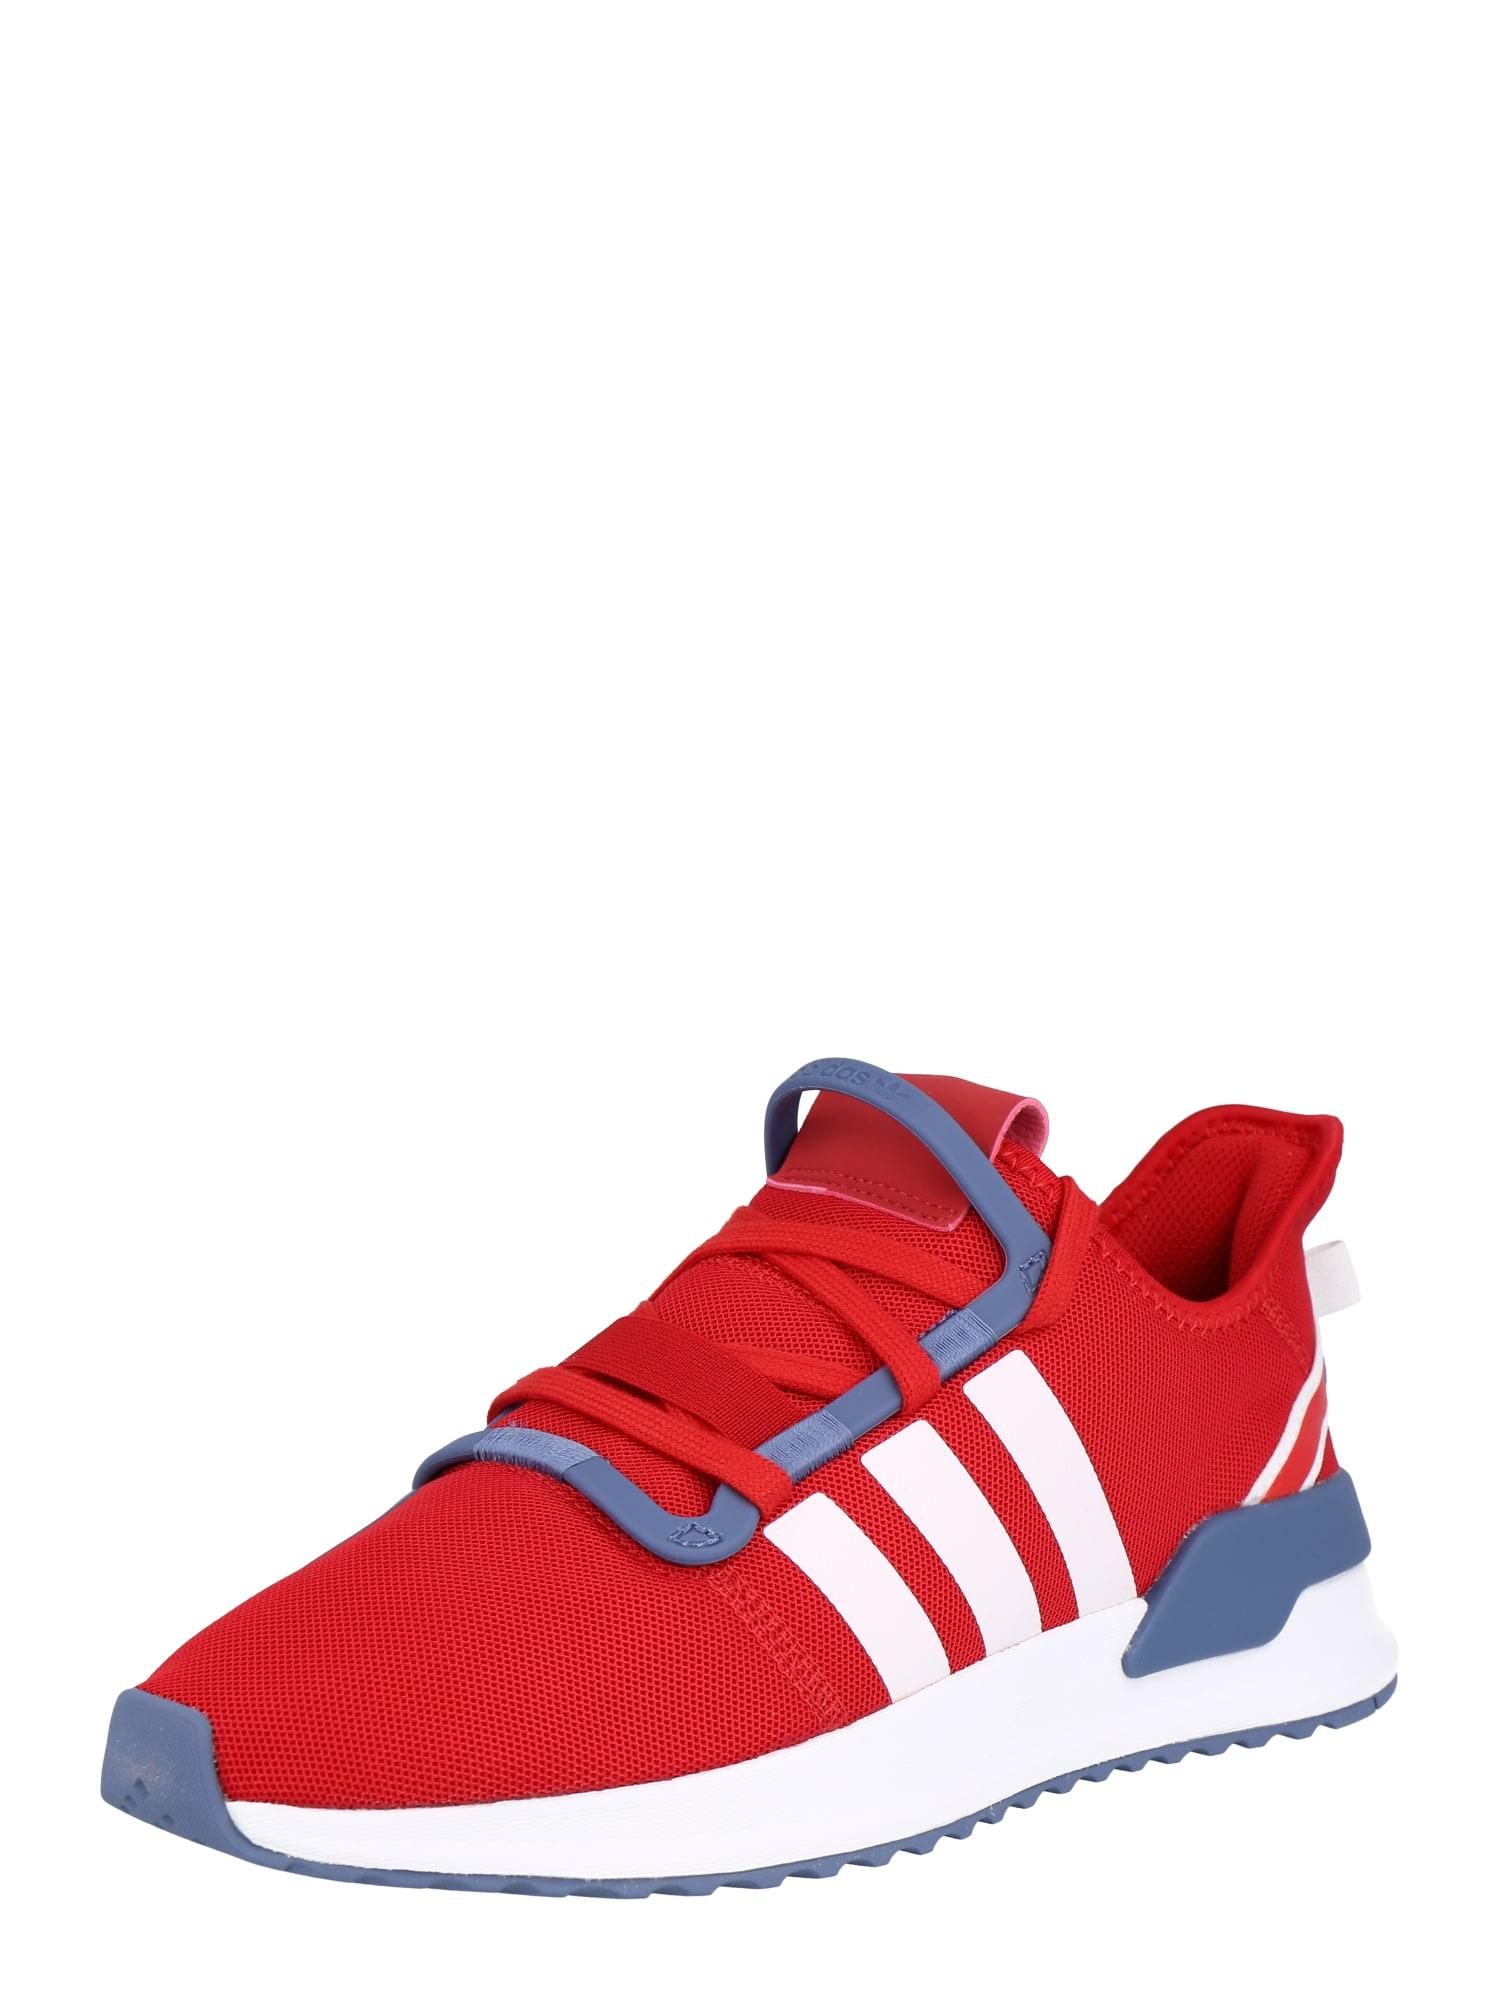 ADIDAS ORIGINALS Nízke tenisky  červená / biela / modrosivá